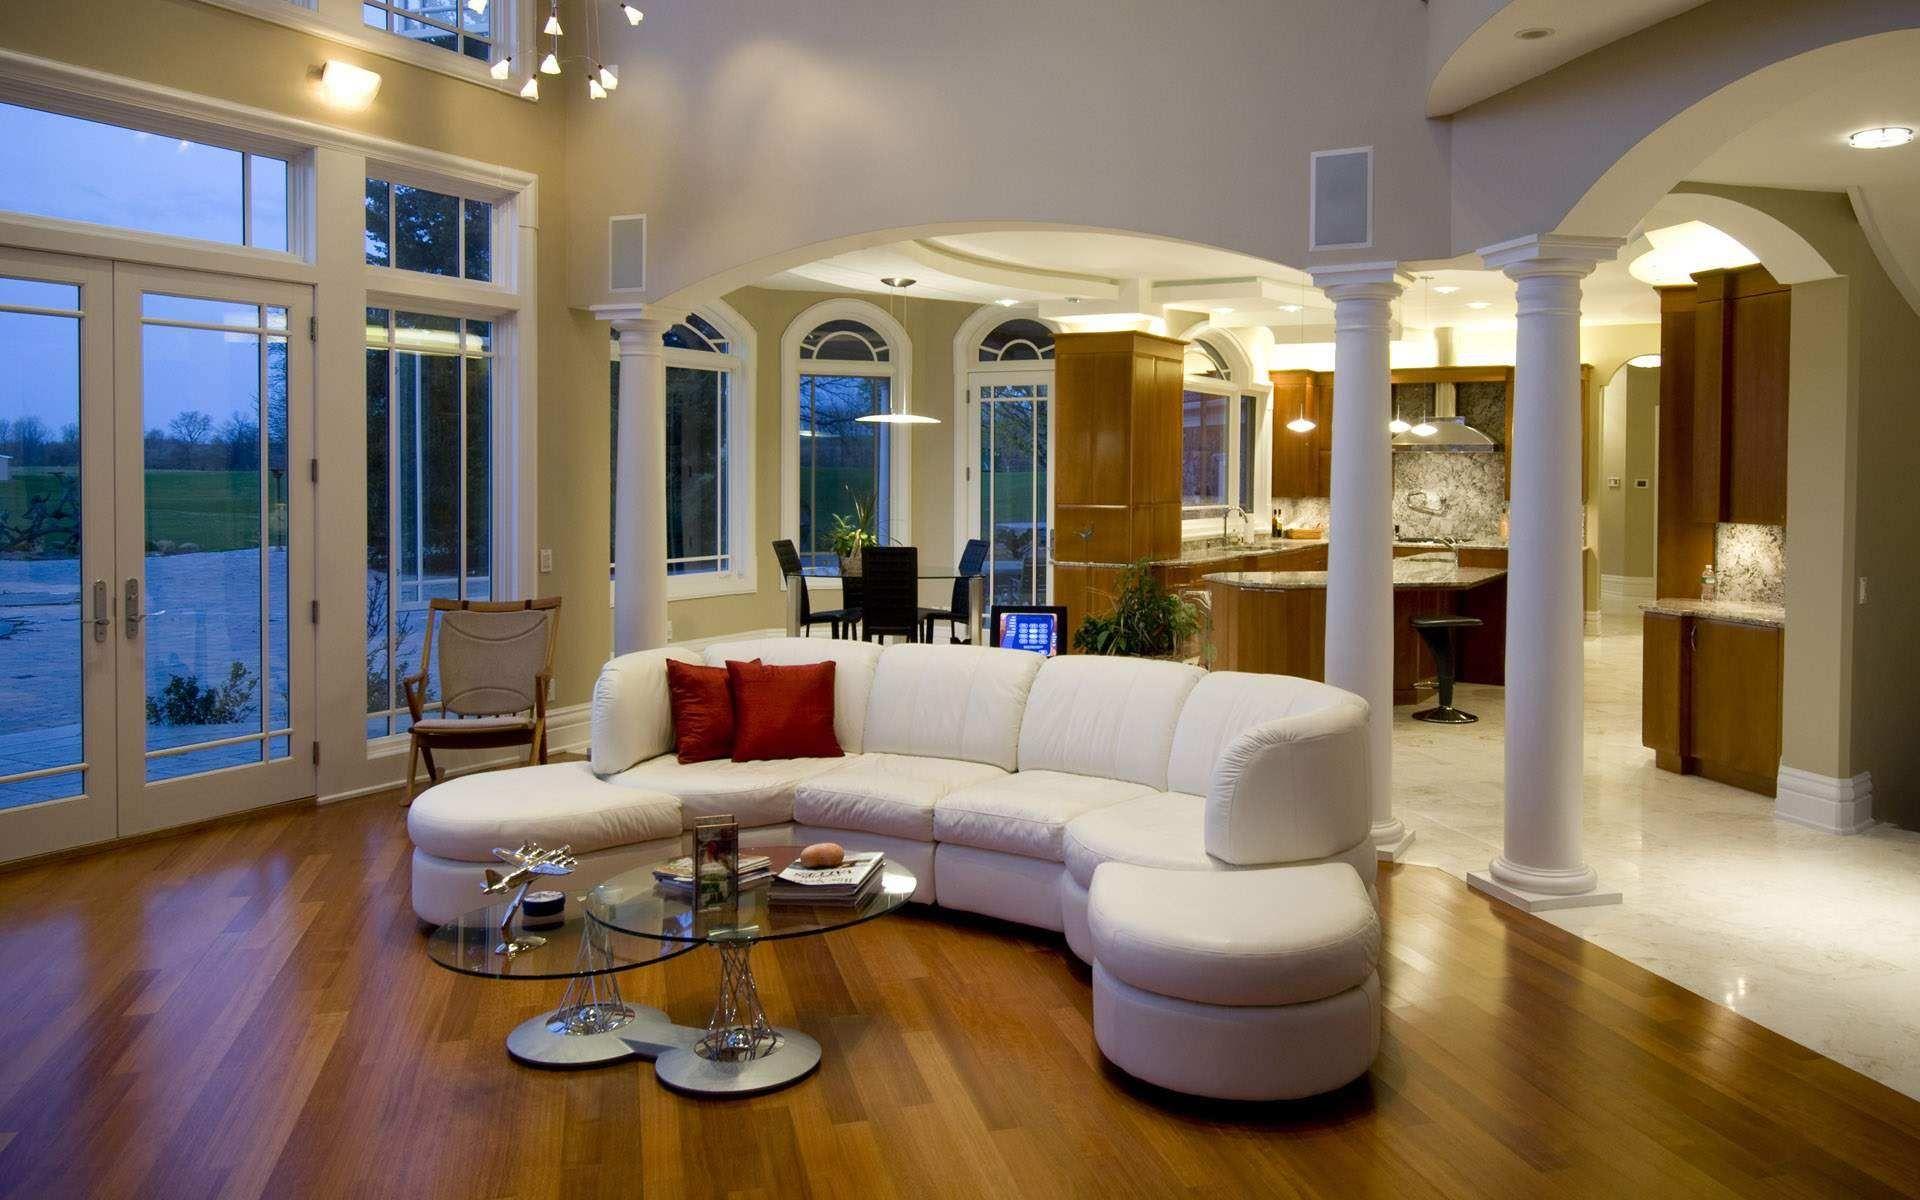 Luxury living room home interior design ideas also rh pinterest